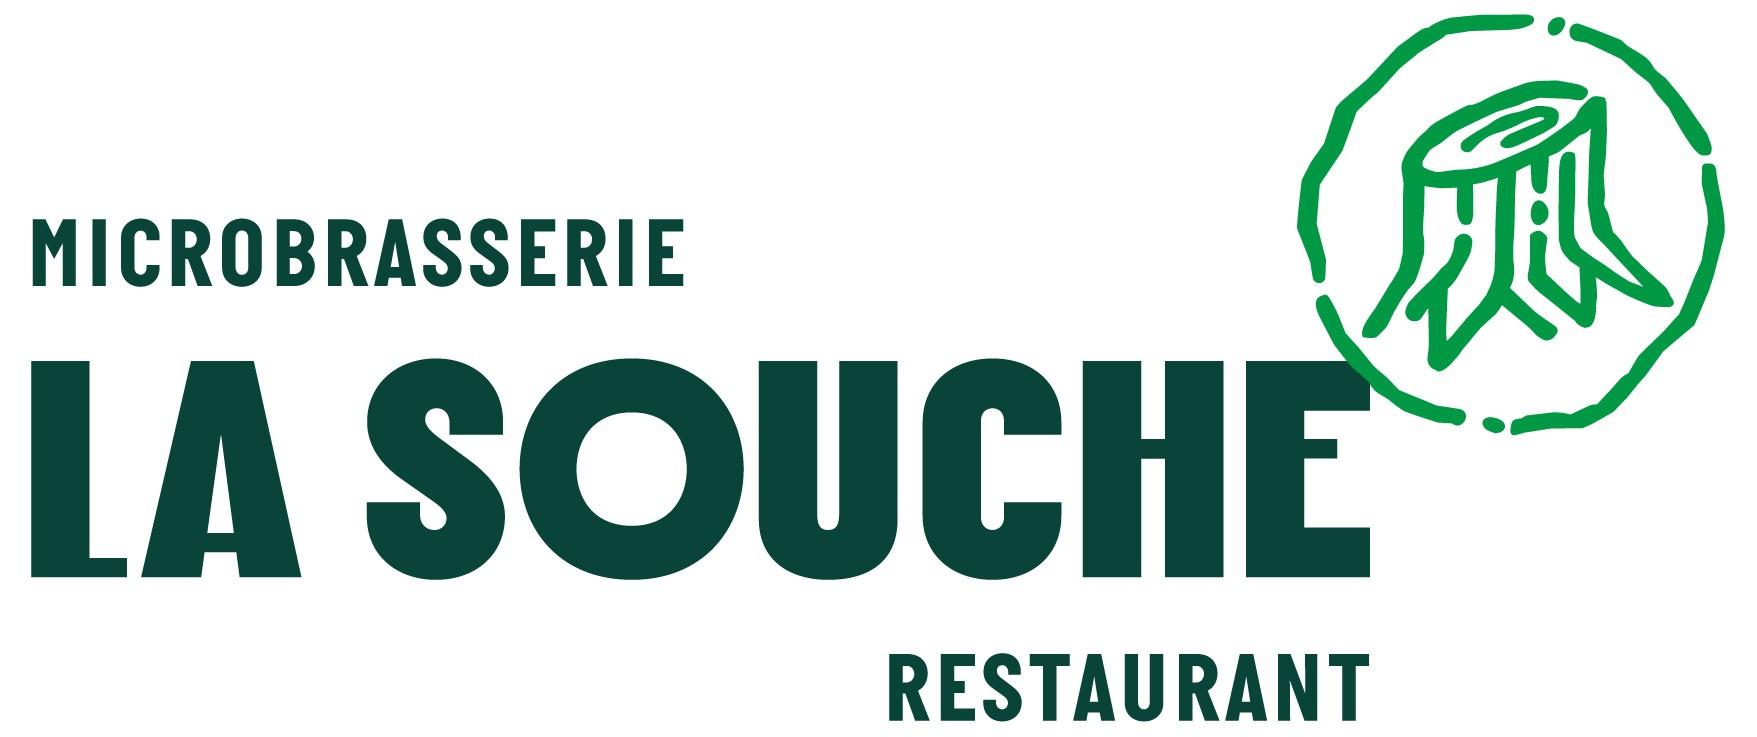 La Souche Microbrasserie-Restaurant